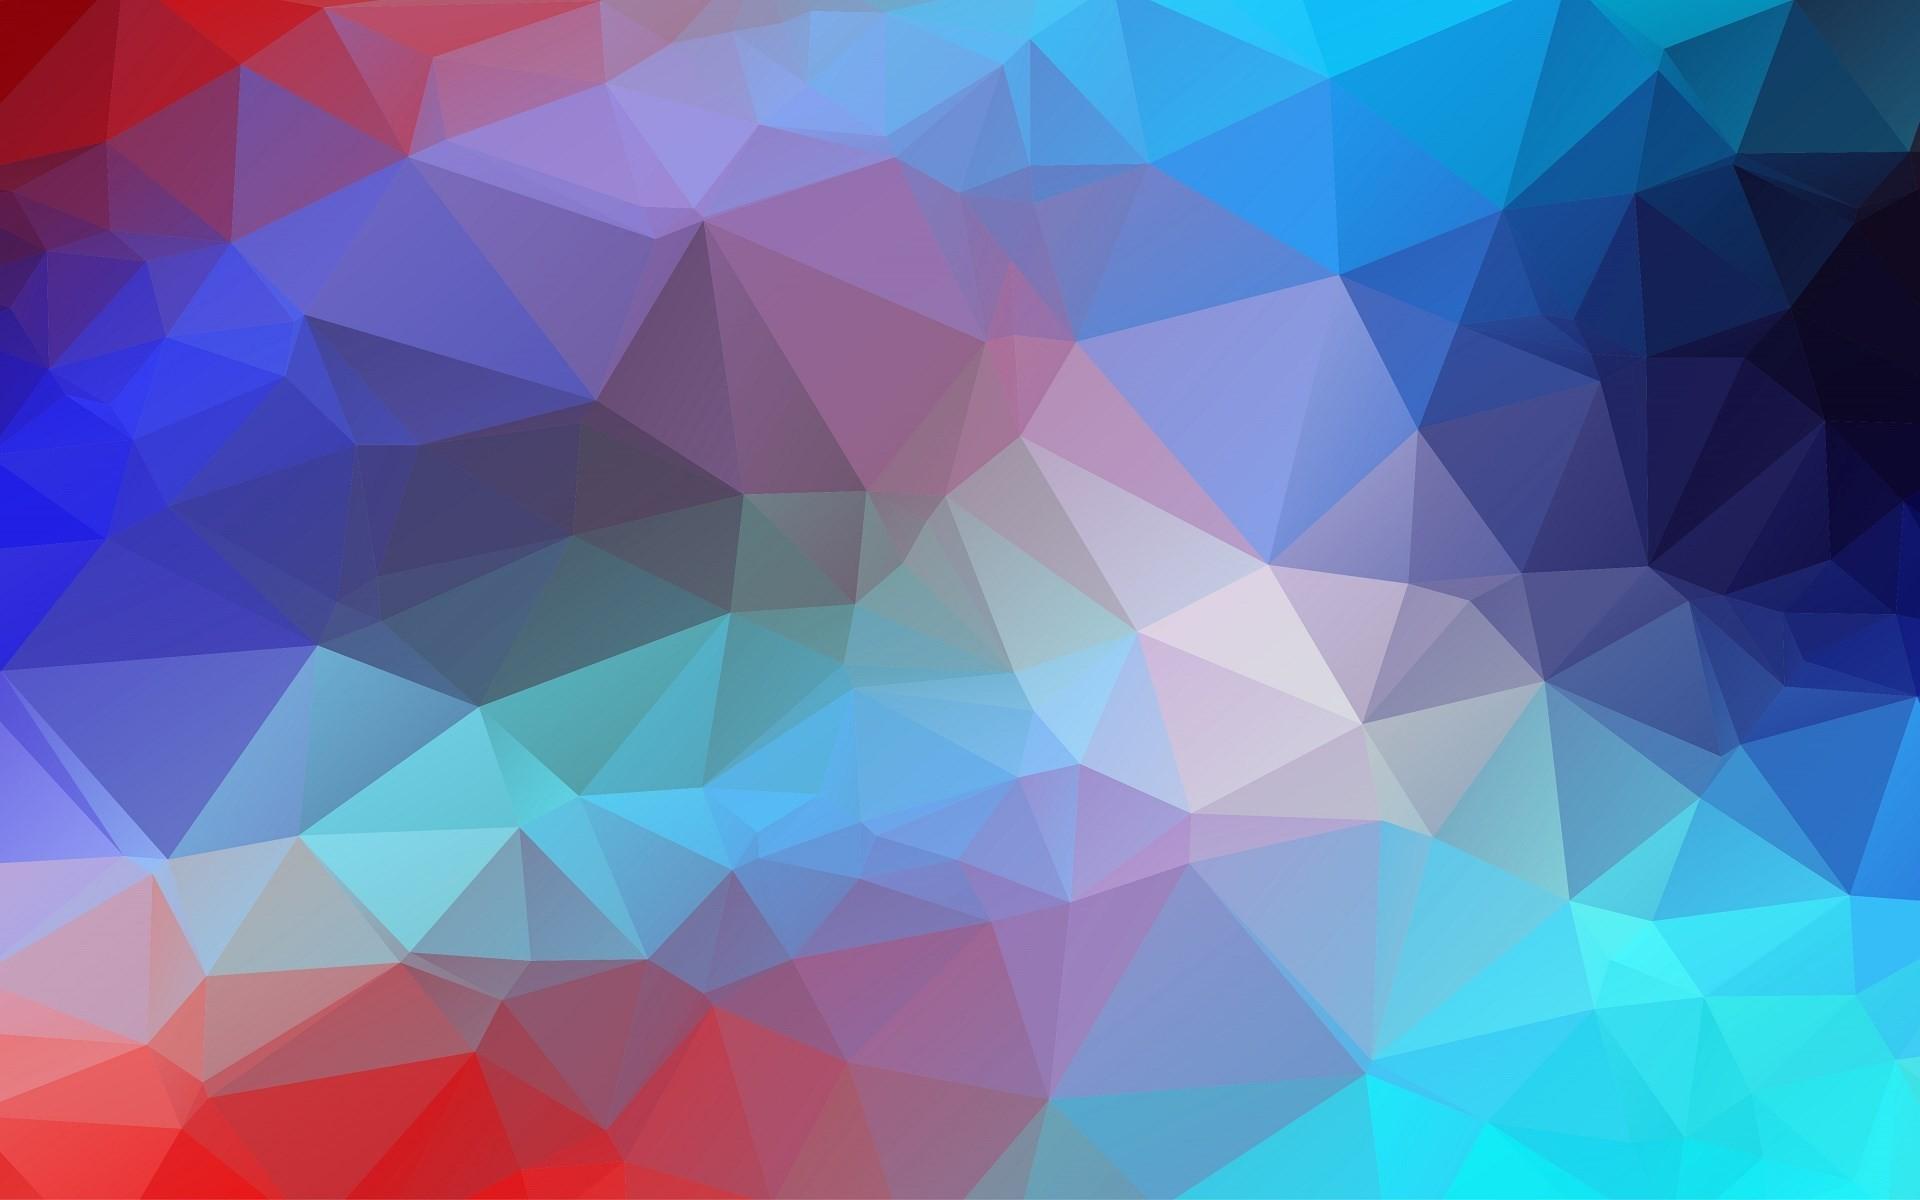 wallpaper images geometry